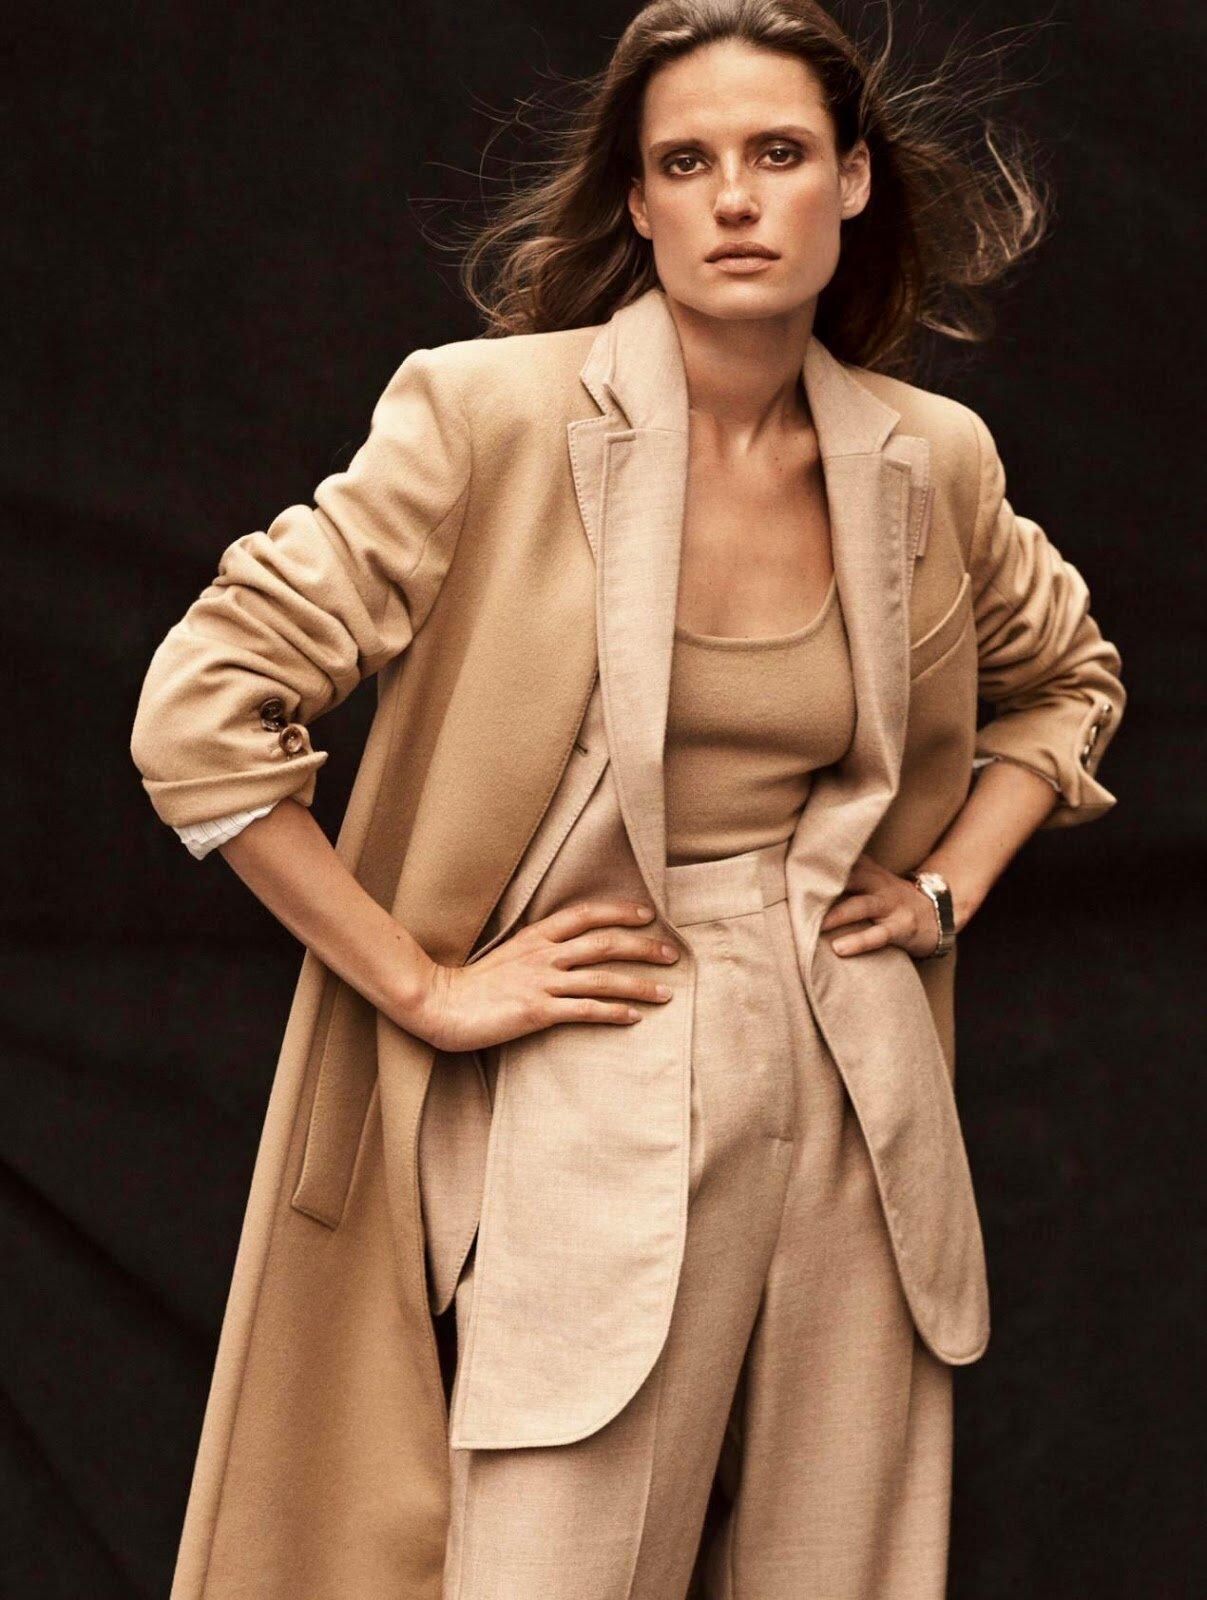 Cate Underwood by Tom Schirmacher for ELLE UK Oct 2019 (4).jpg